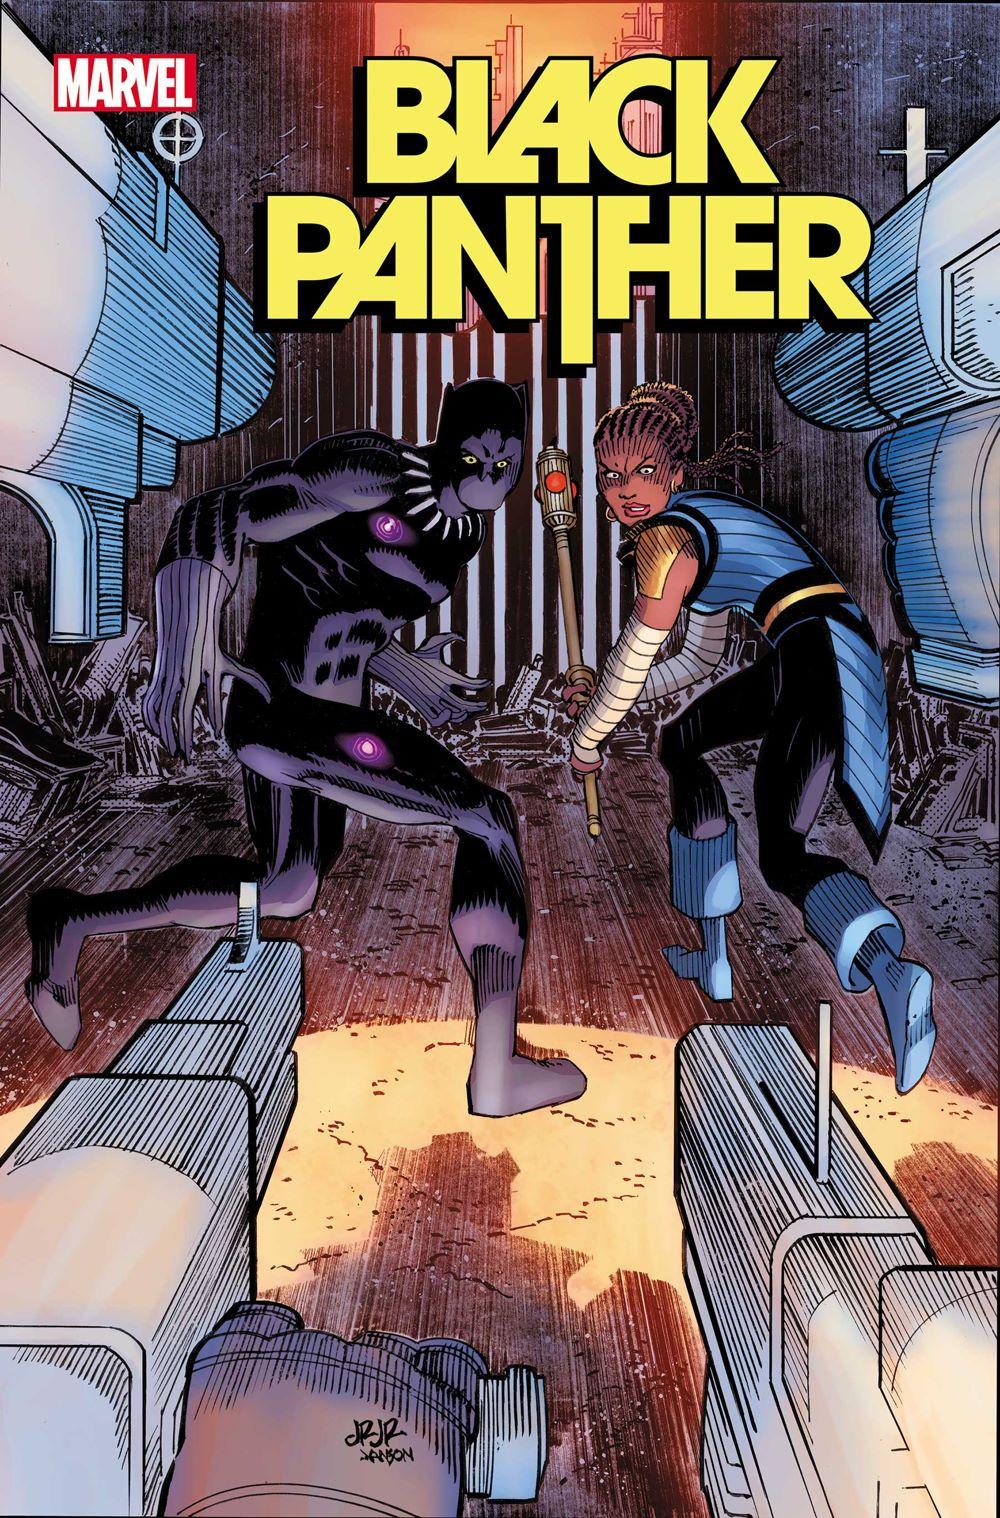 BLAP2021001_Romita_Var Marvel Comics August 2021 Solicitations